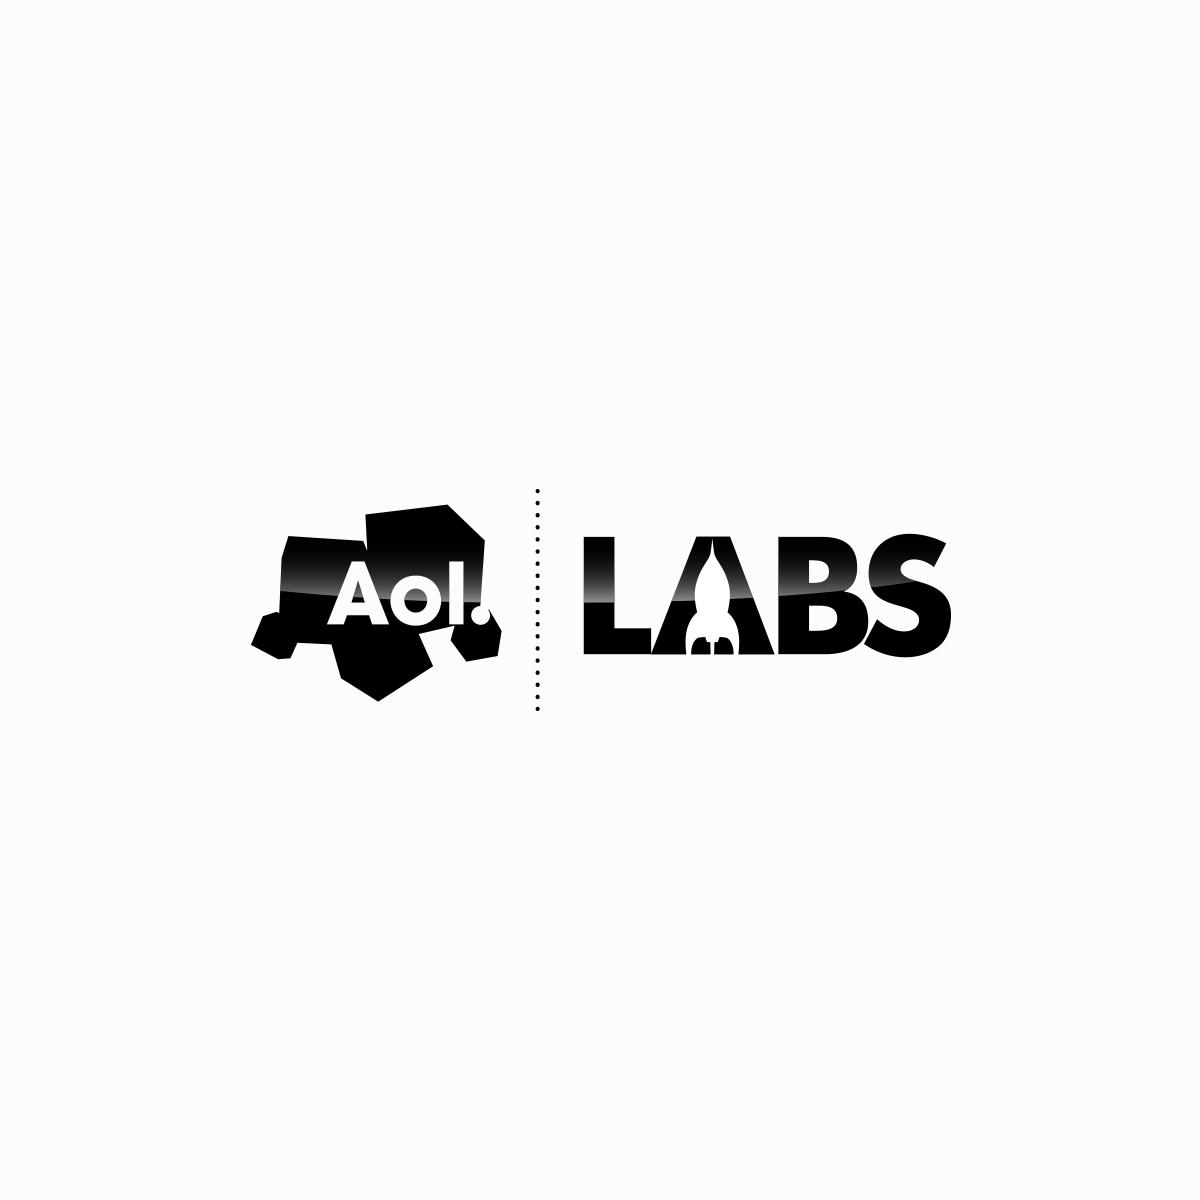 Aol. Labs